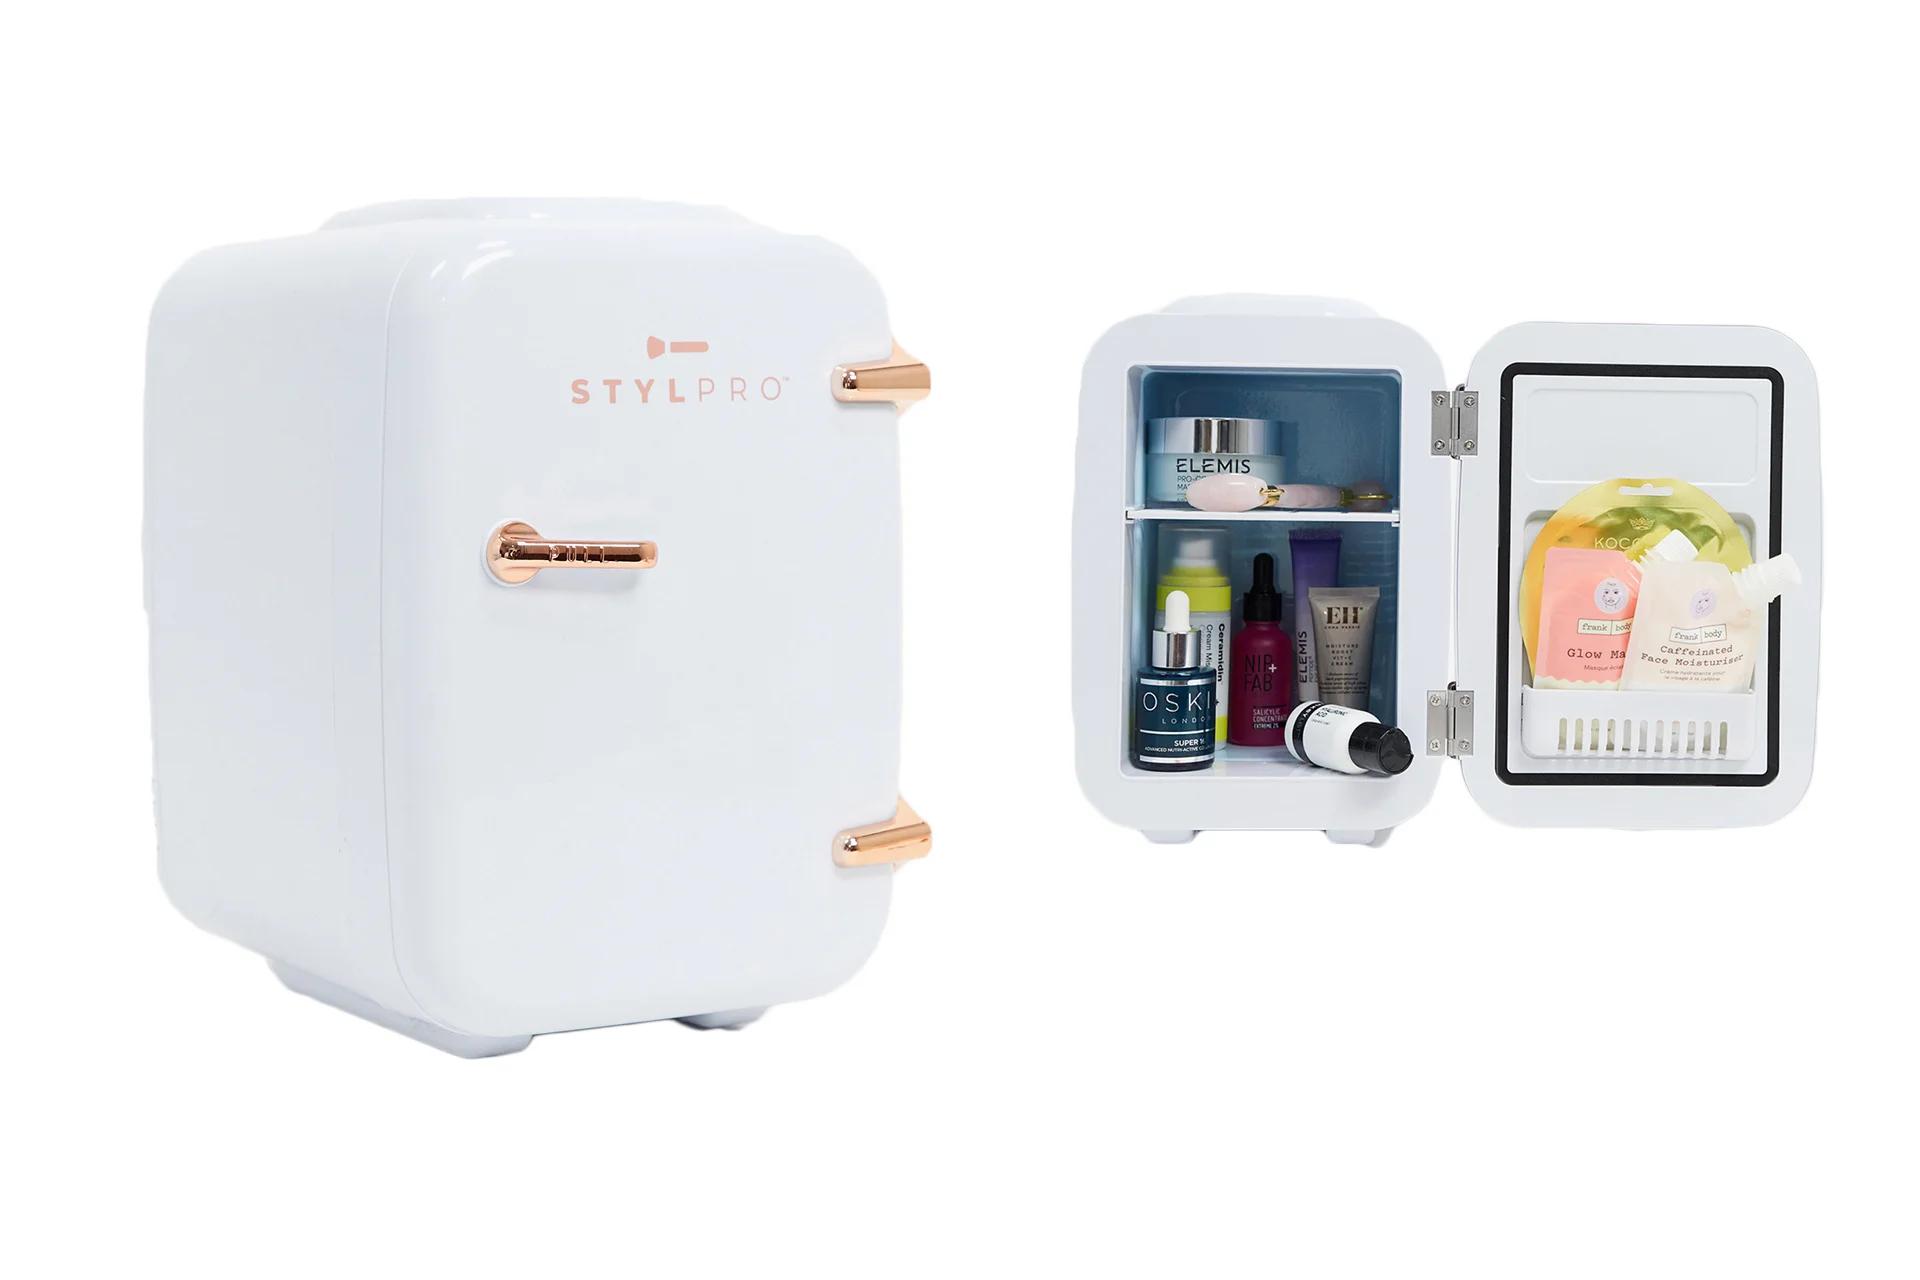 Stylpro x ASOS cosmetic fridge